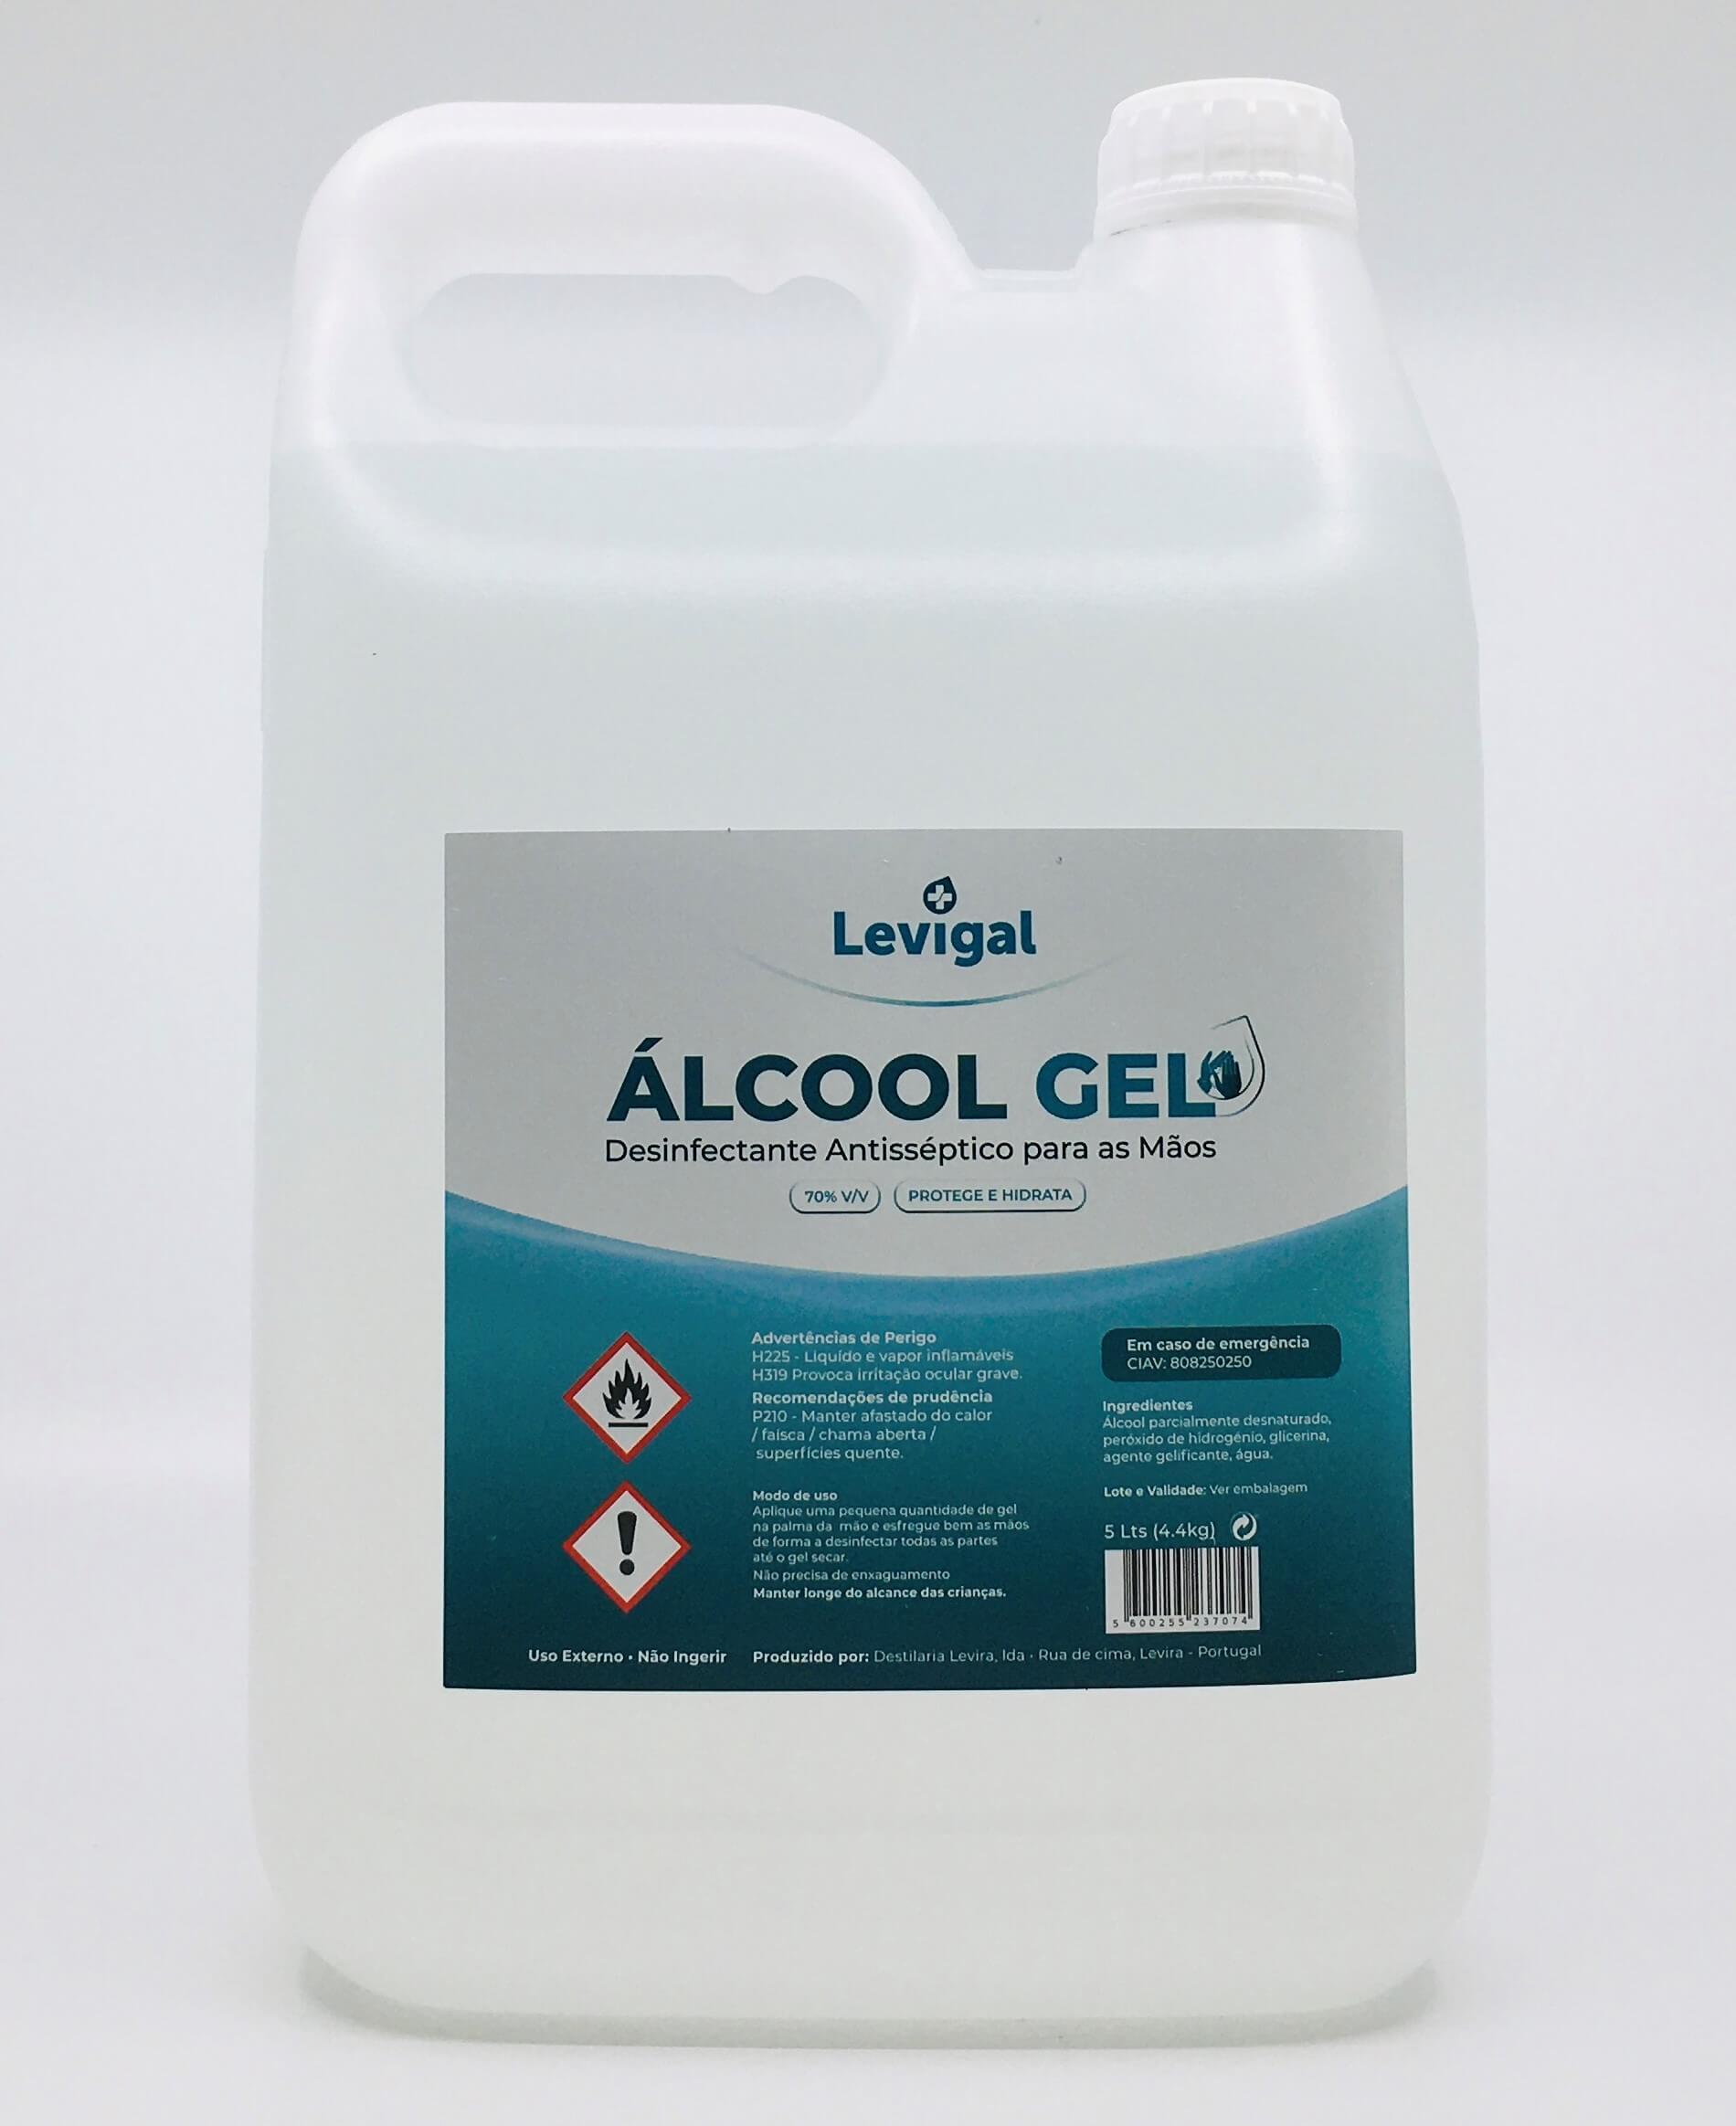 ALCOOL GEL LEVIGAL 70%